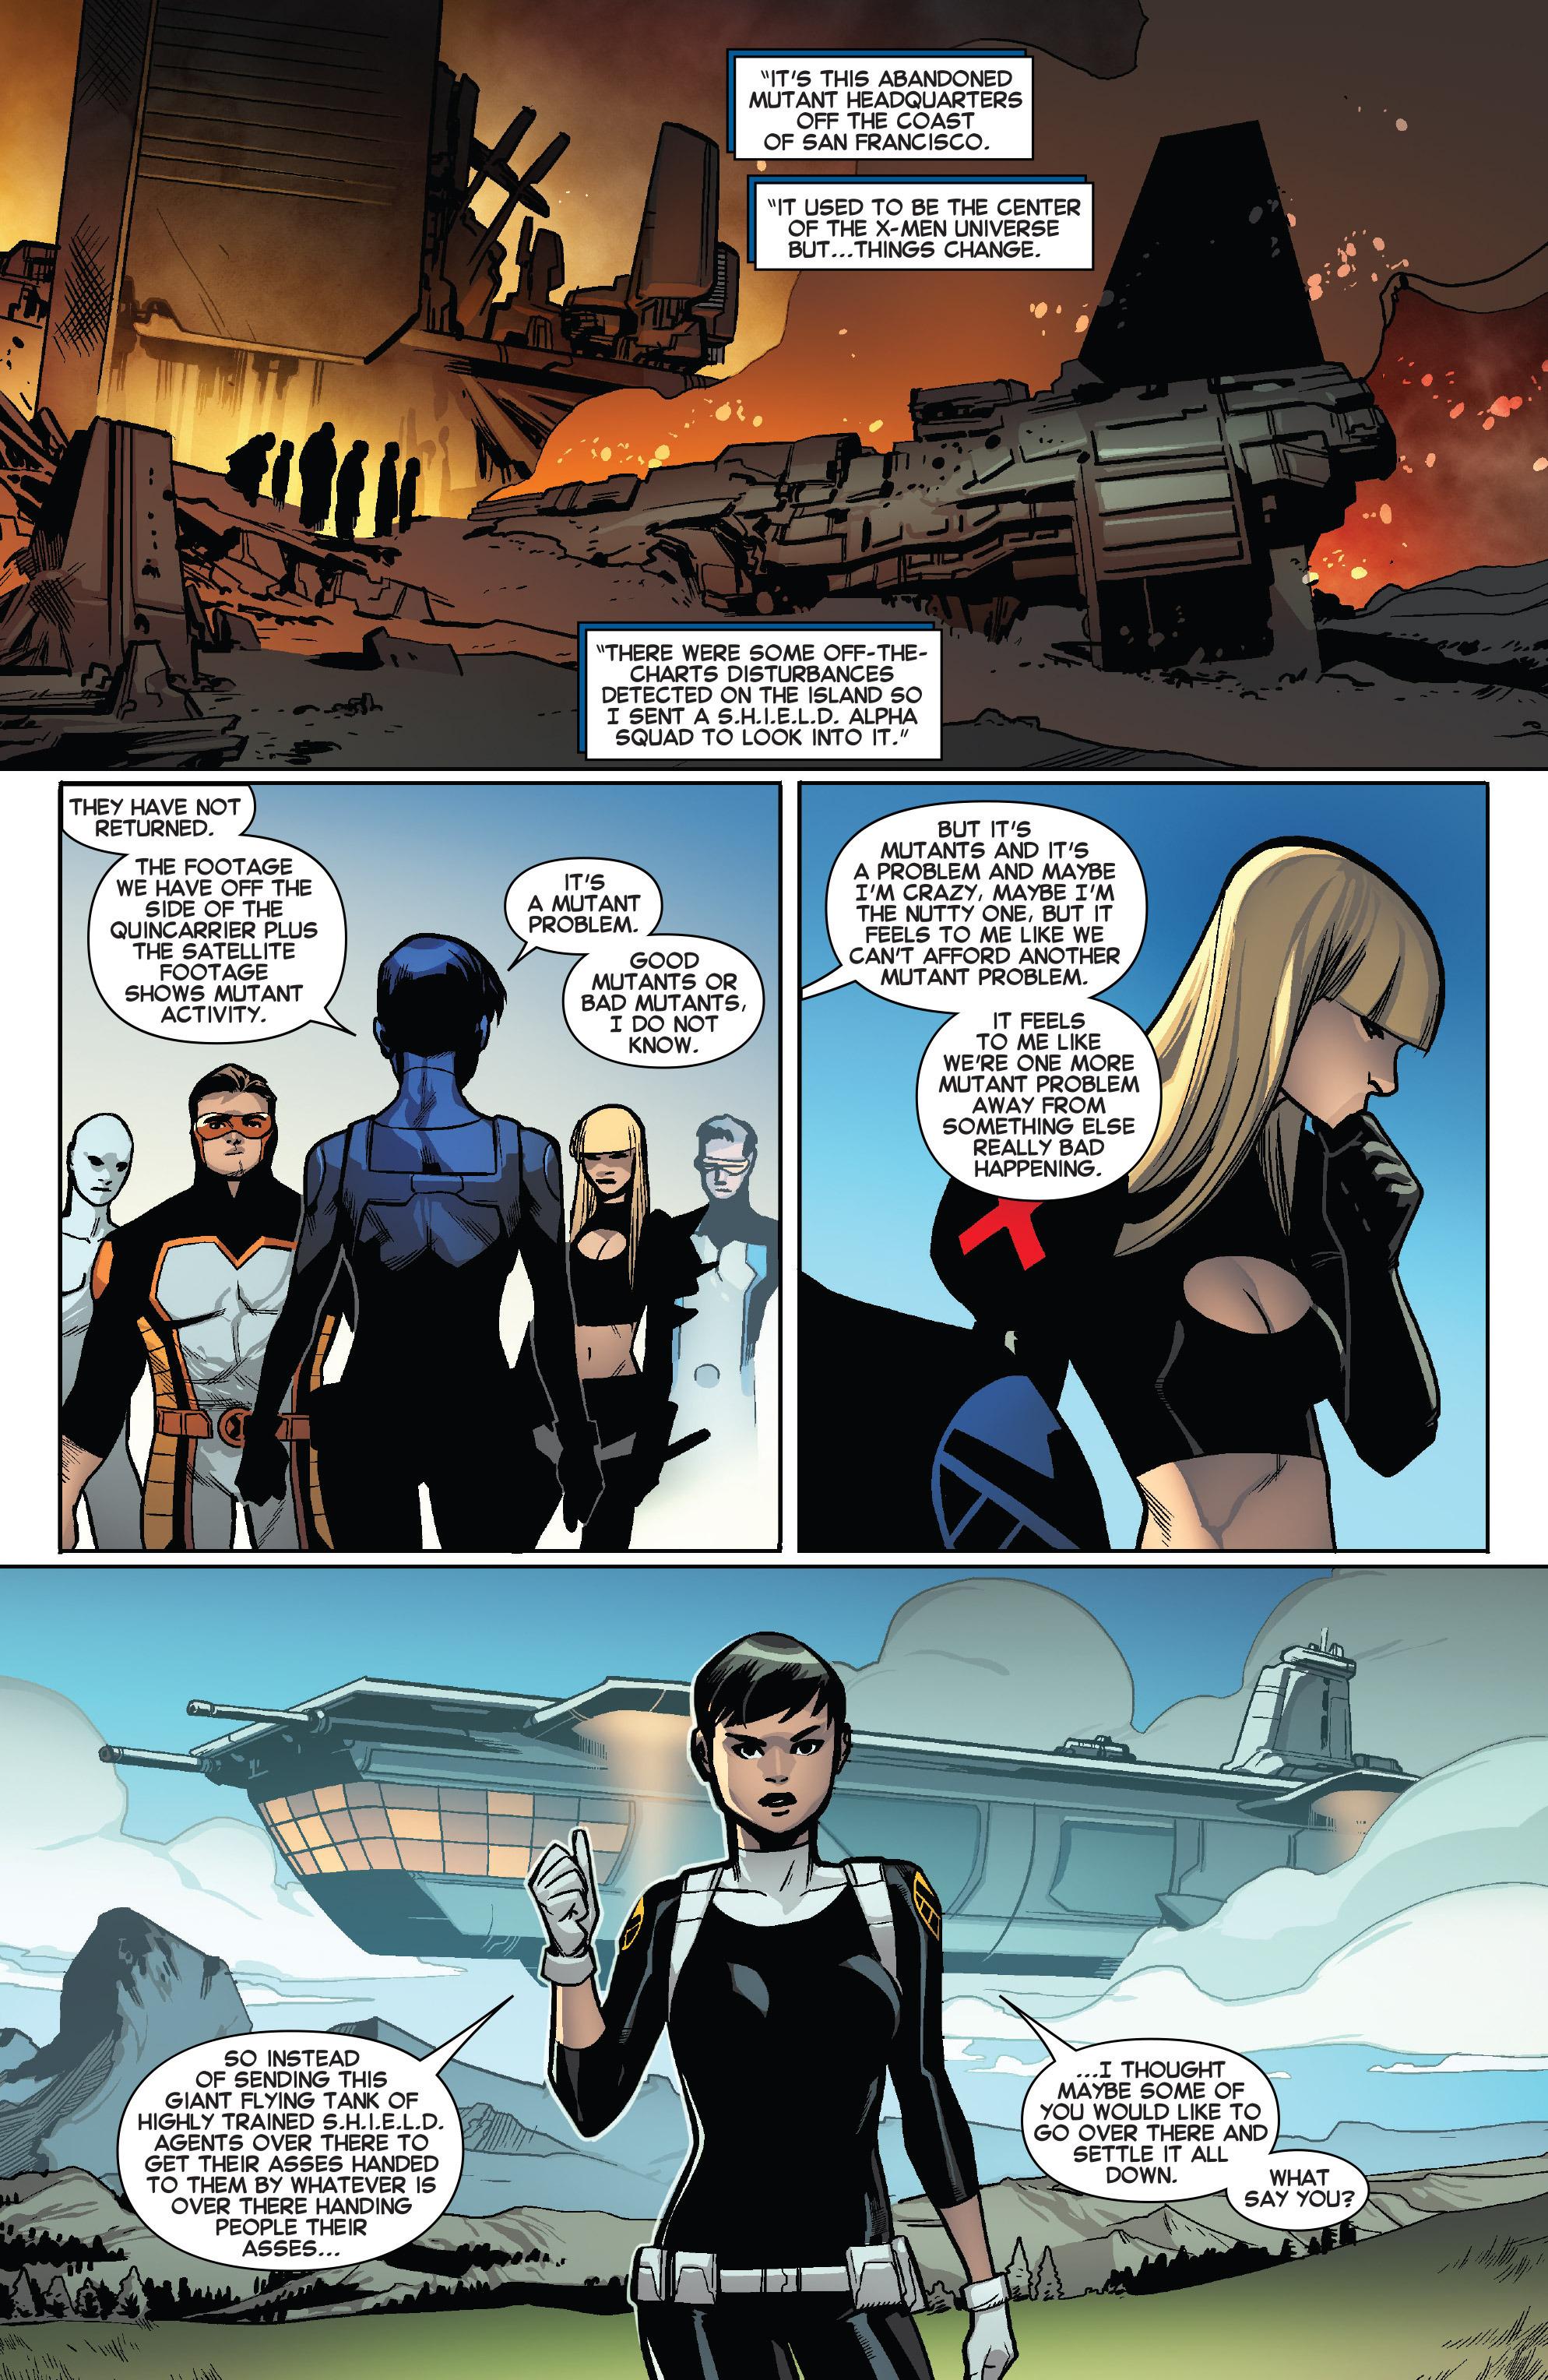 All-New X-Men (2013) chap 41 pic 6